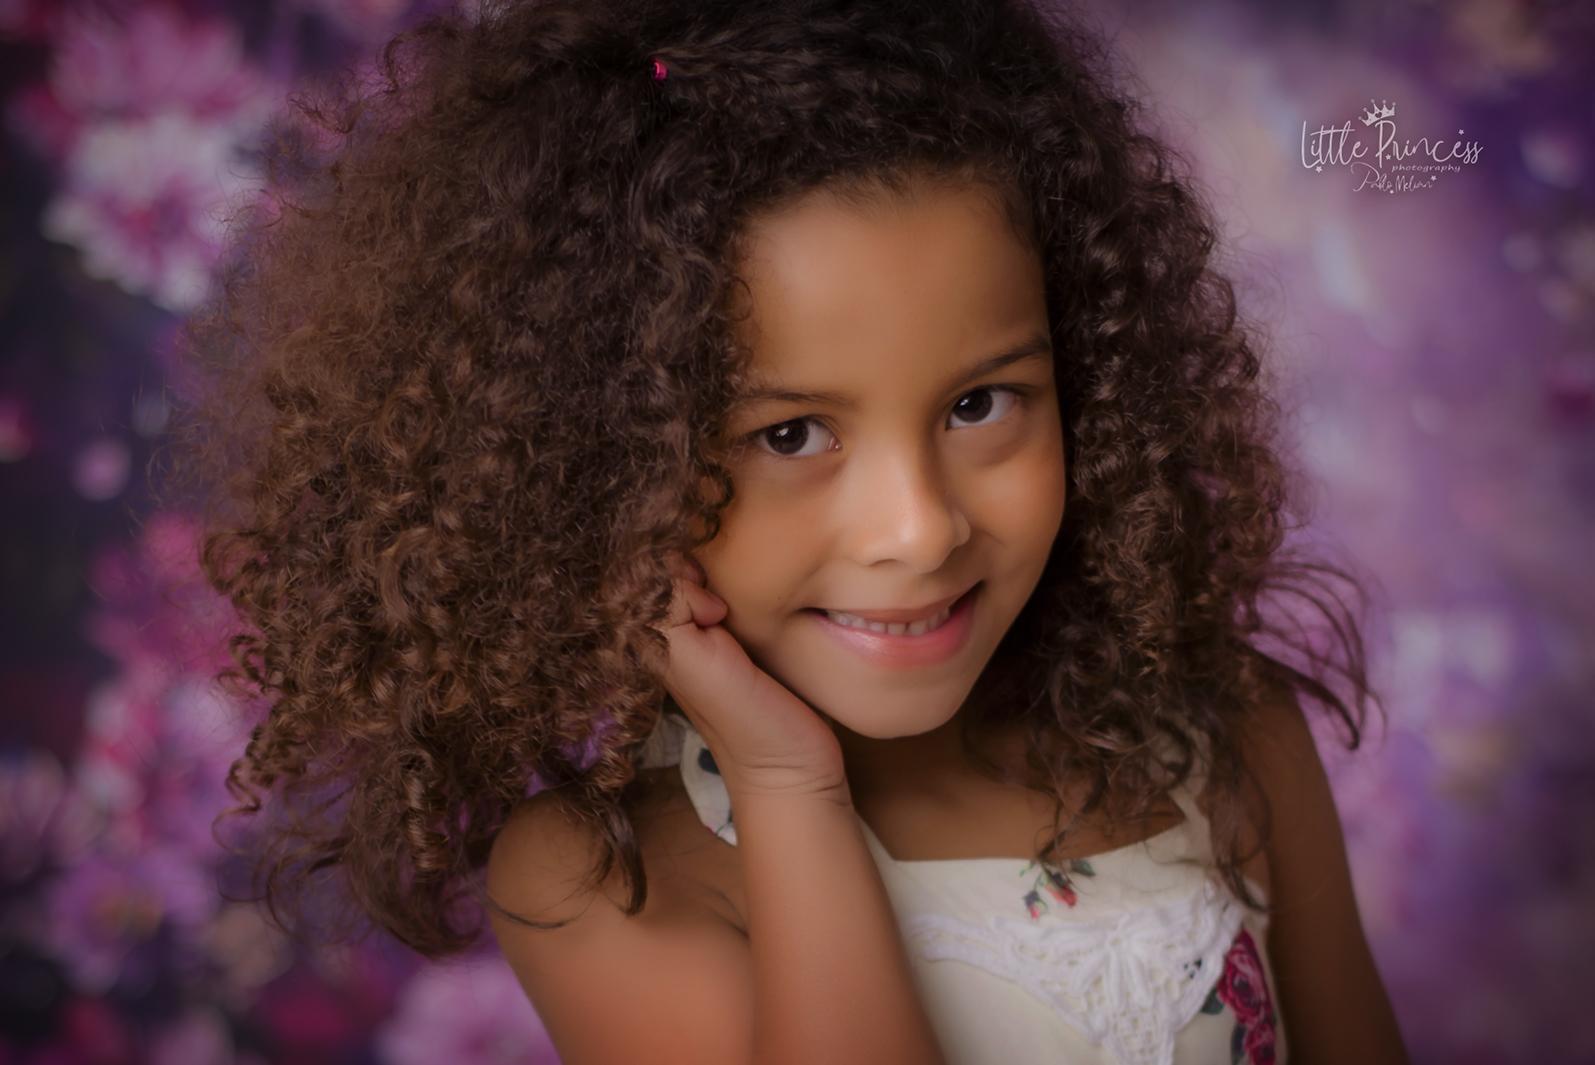 ESTUDIO DE FOTOS INFANTIL EN TENERIFE  little princess sesión fotos